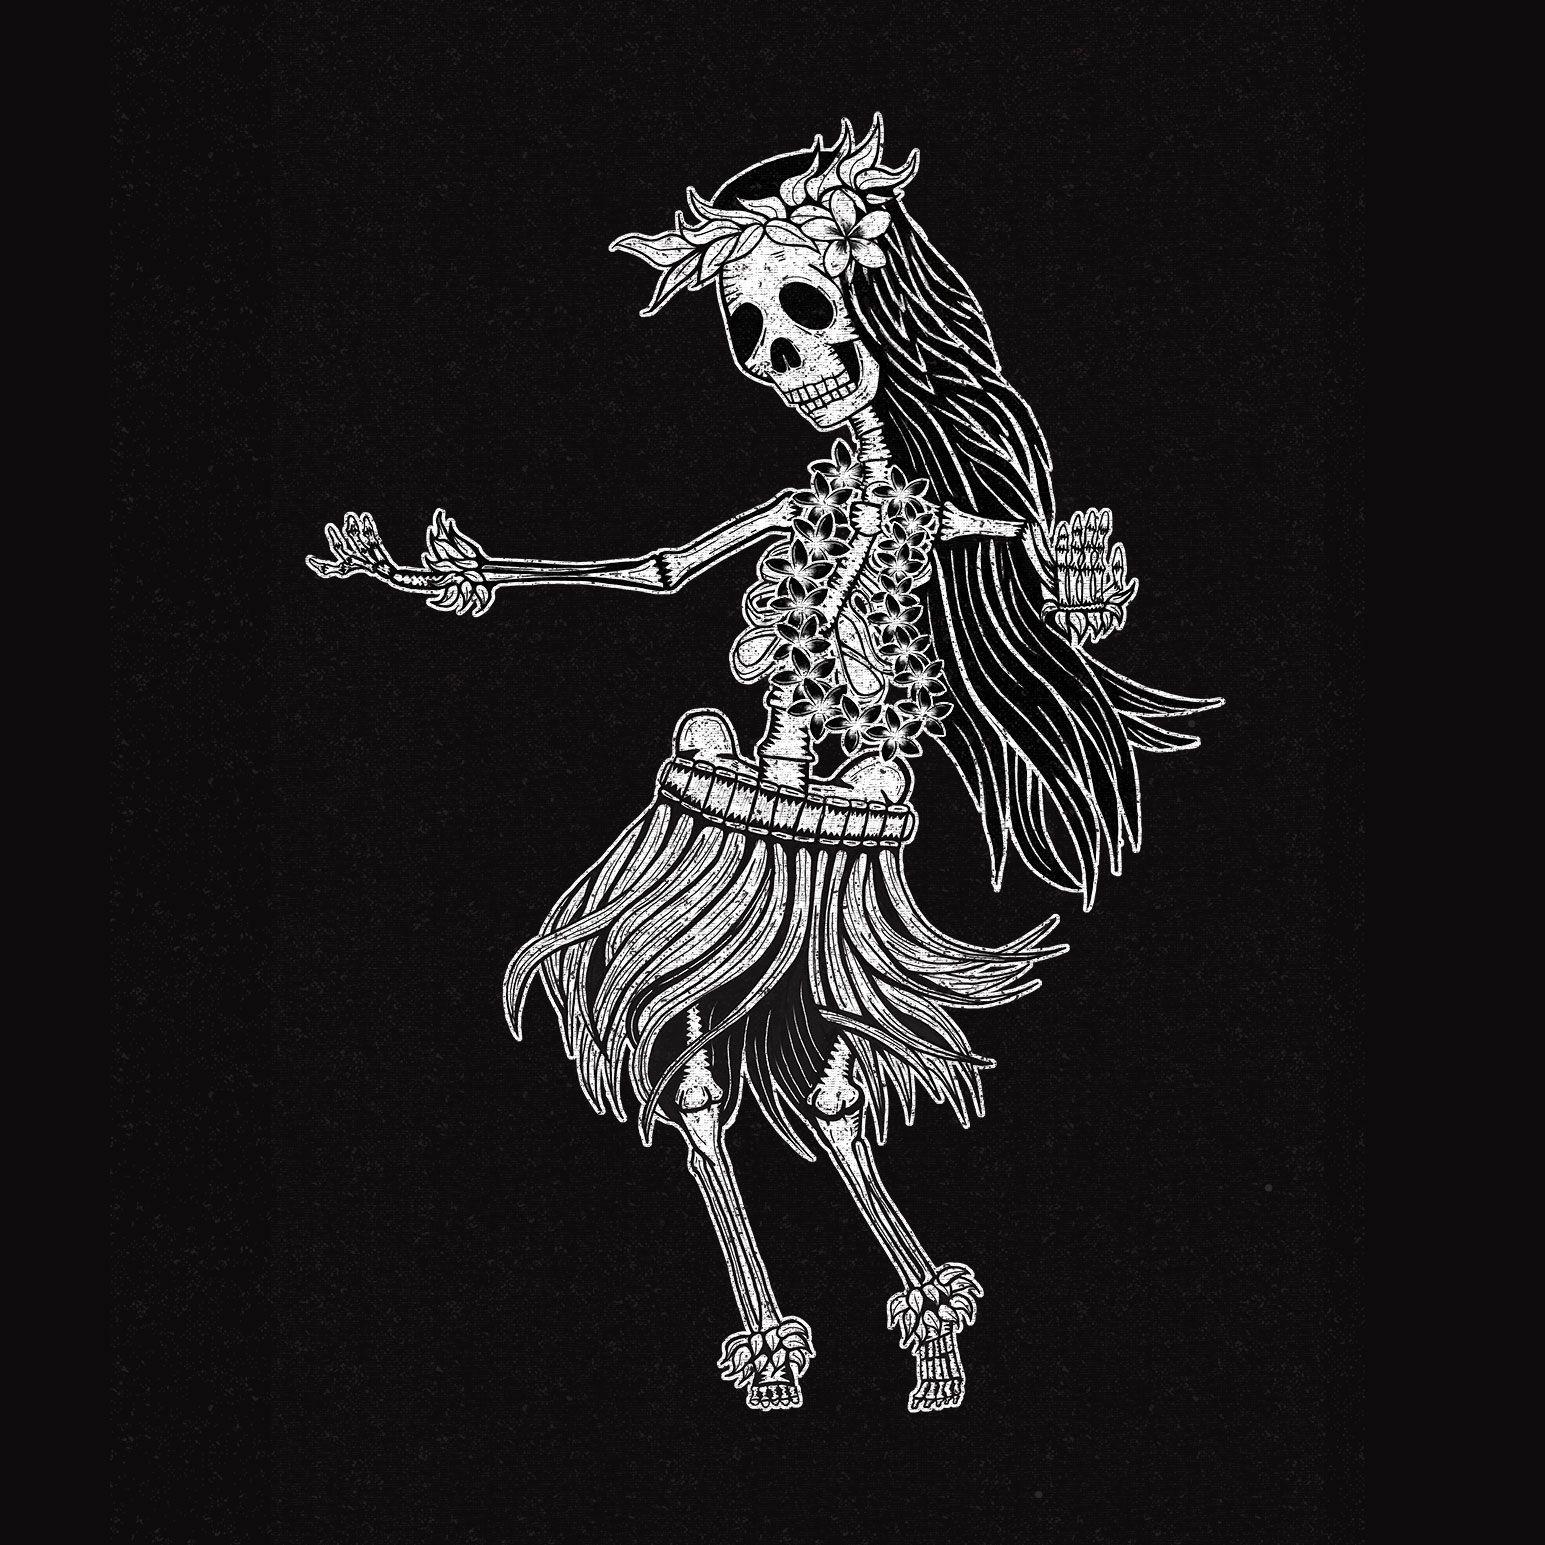 Made with #procreateapp, #ipadpro and #photoshop. #character #skeleton #huladancer #hula #halloween